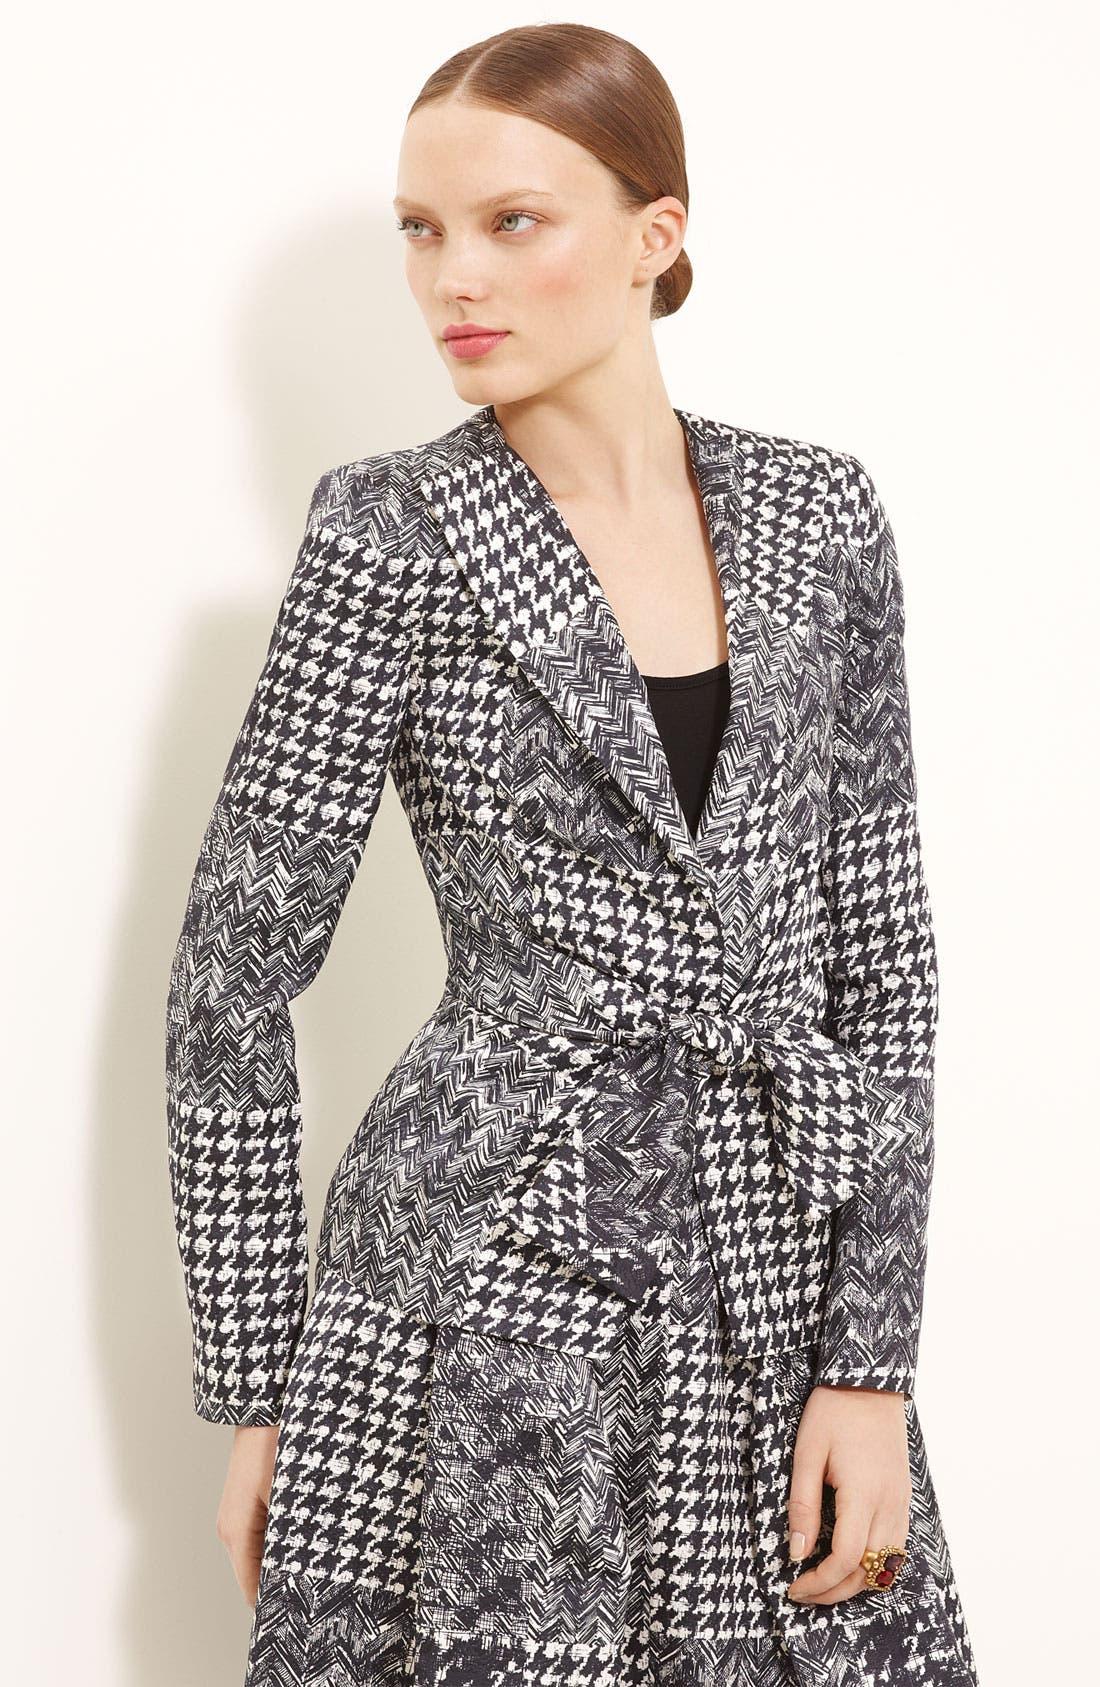 Alternate Image 1 Selected - Oscar de la Renta Tweed & Matelassé Patchwork Jacket